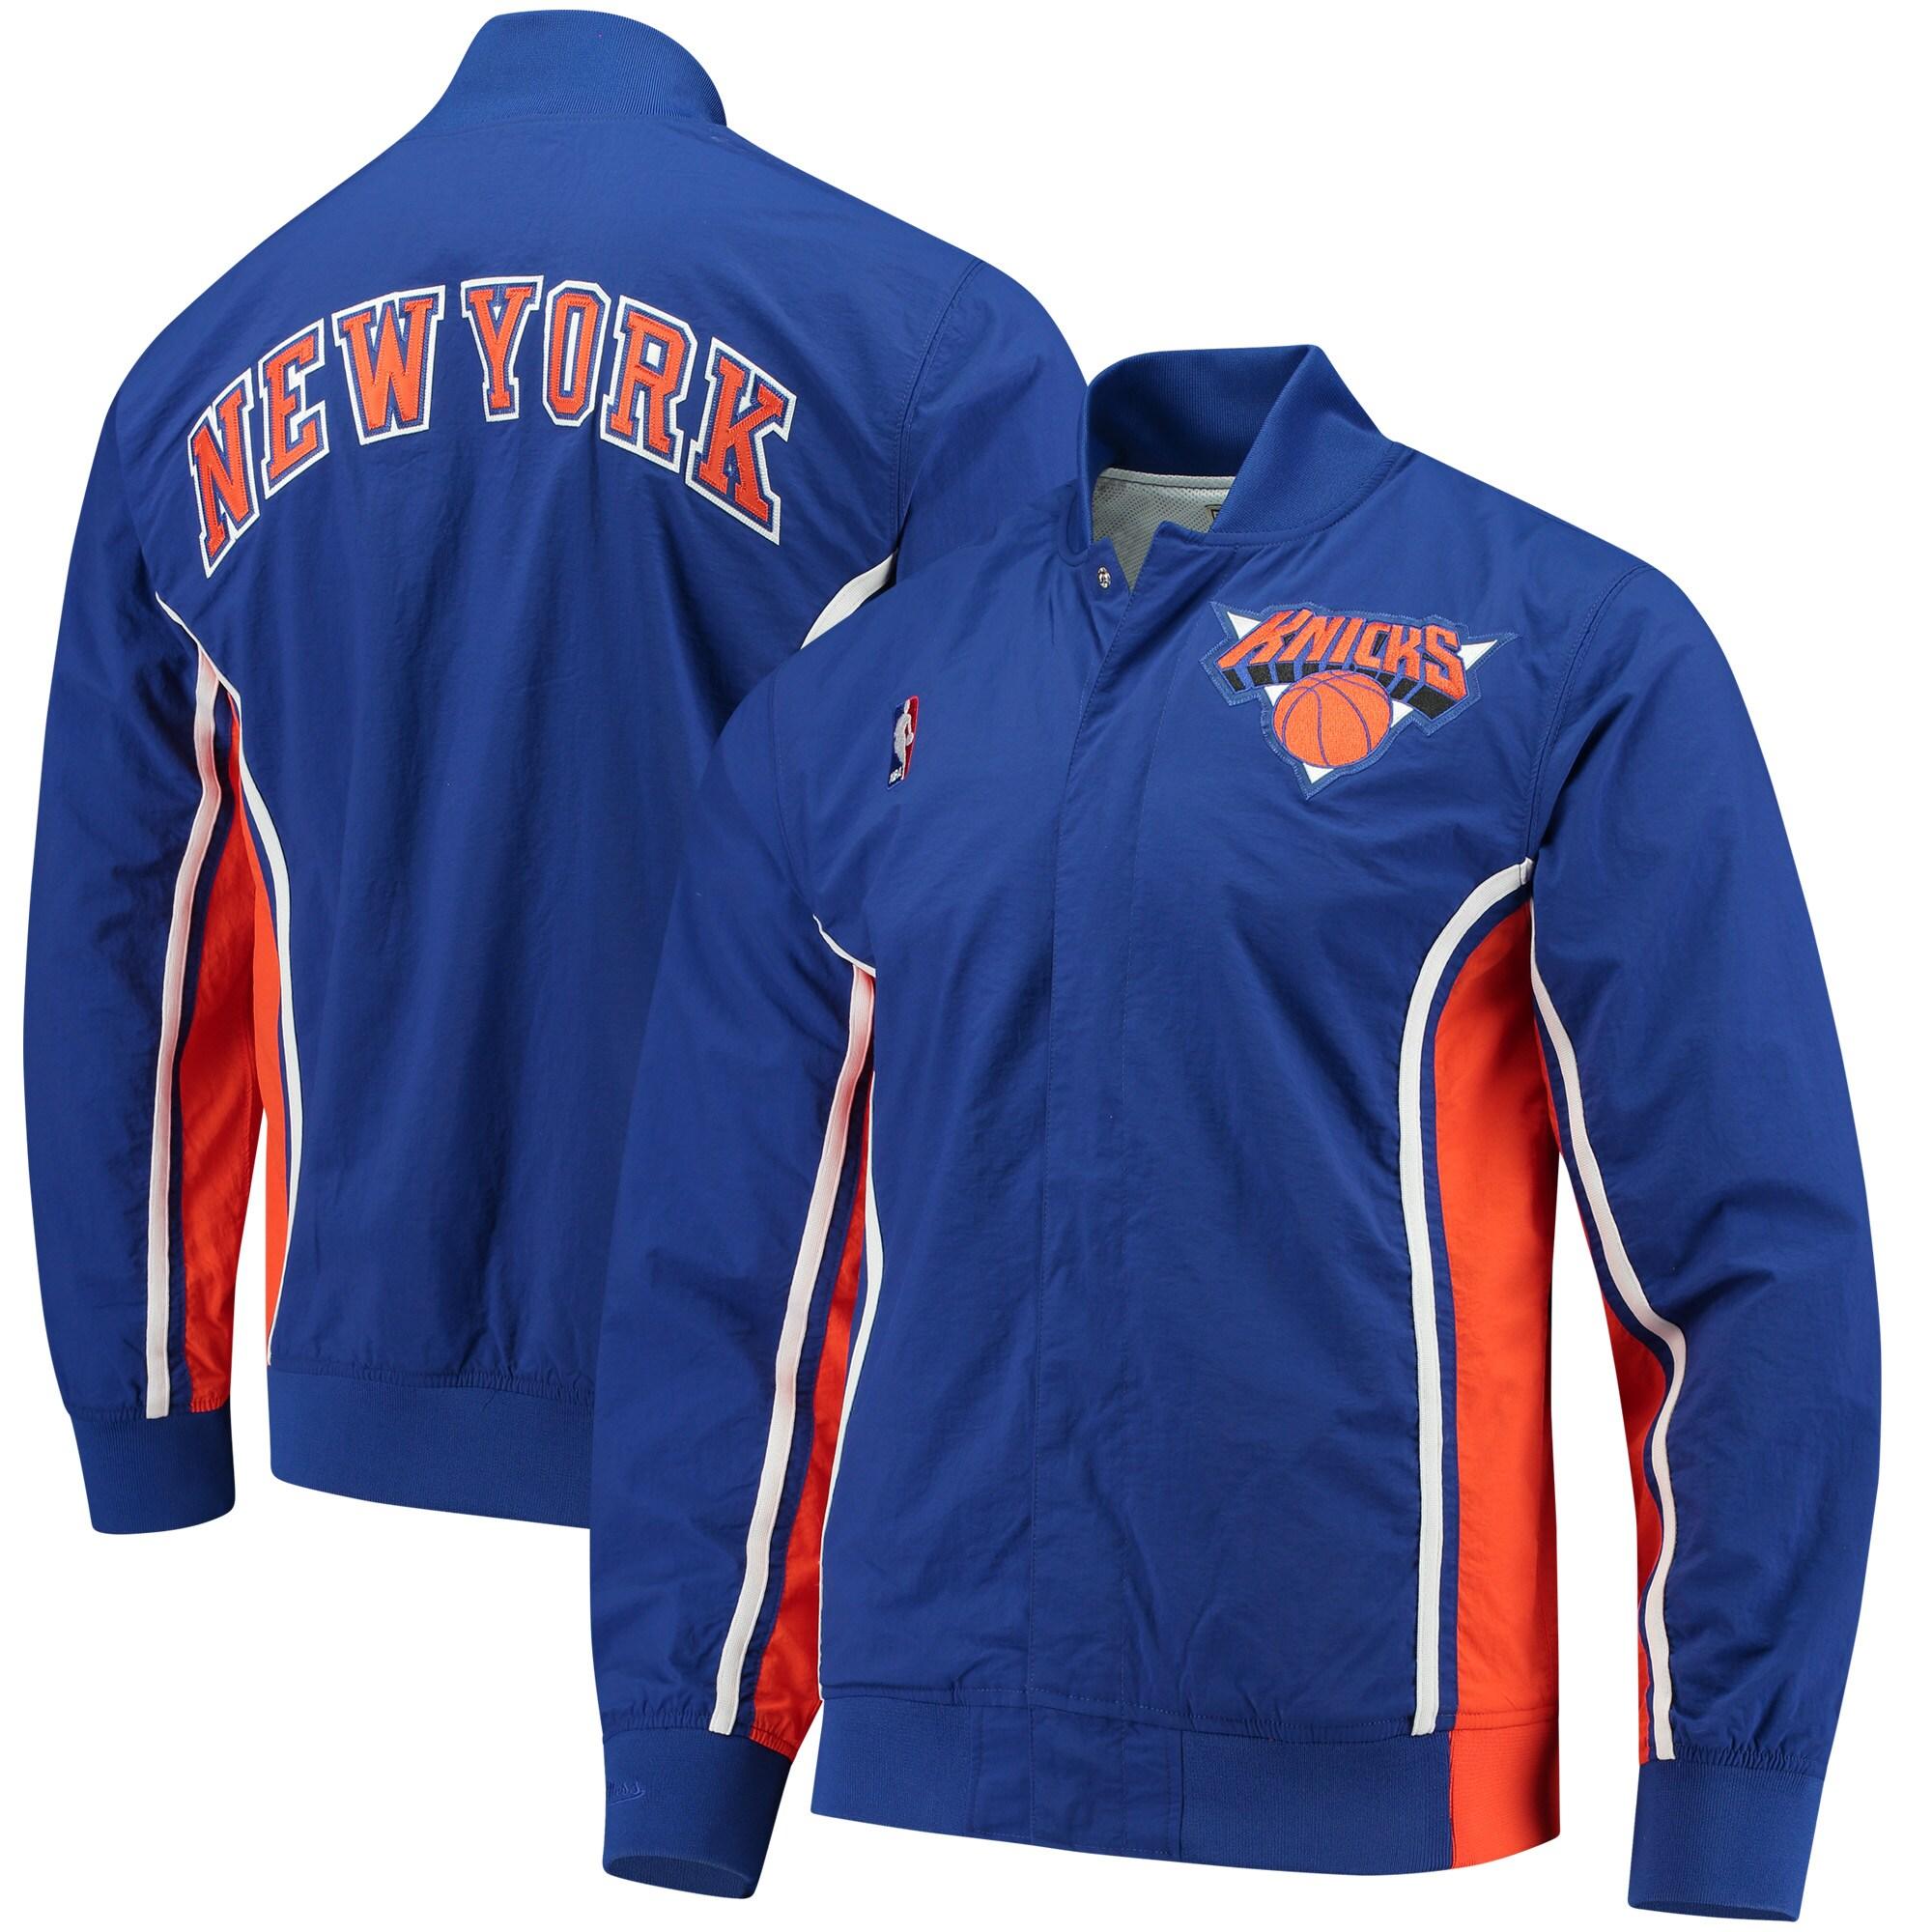 New York Knicks Mitchell & Ness Authentic Warm-Up Jacket - Blue